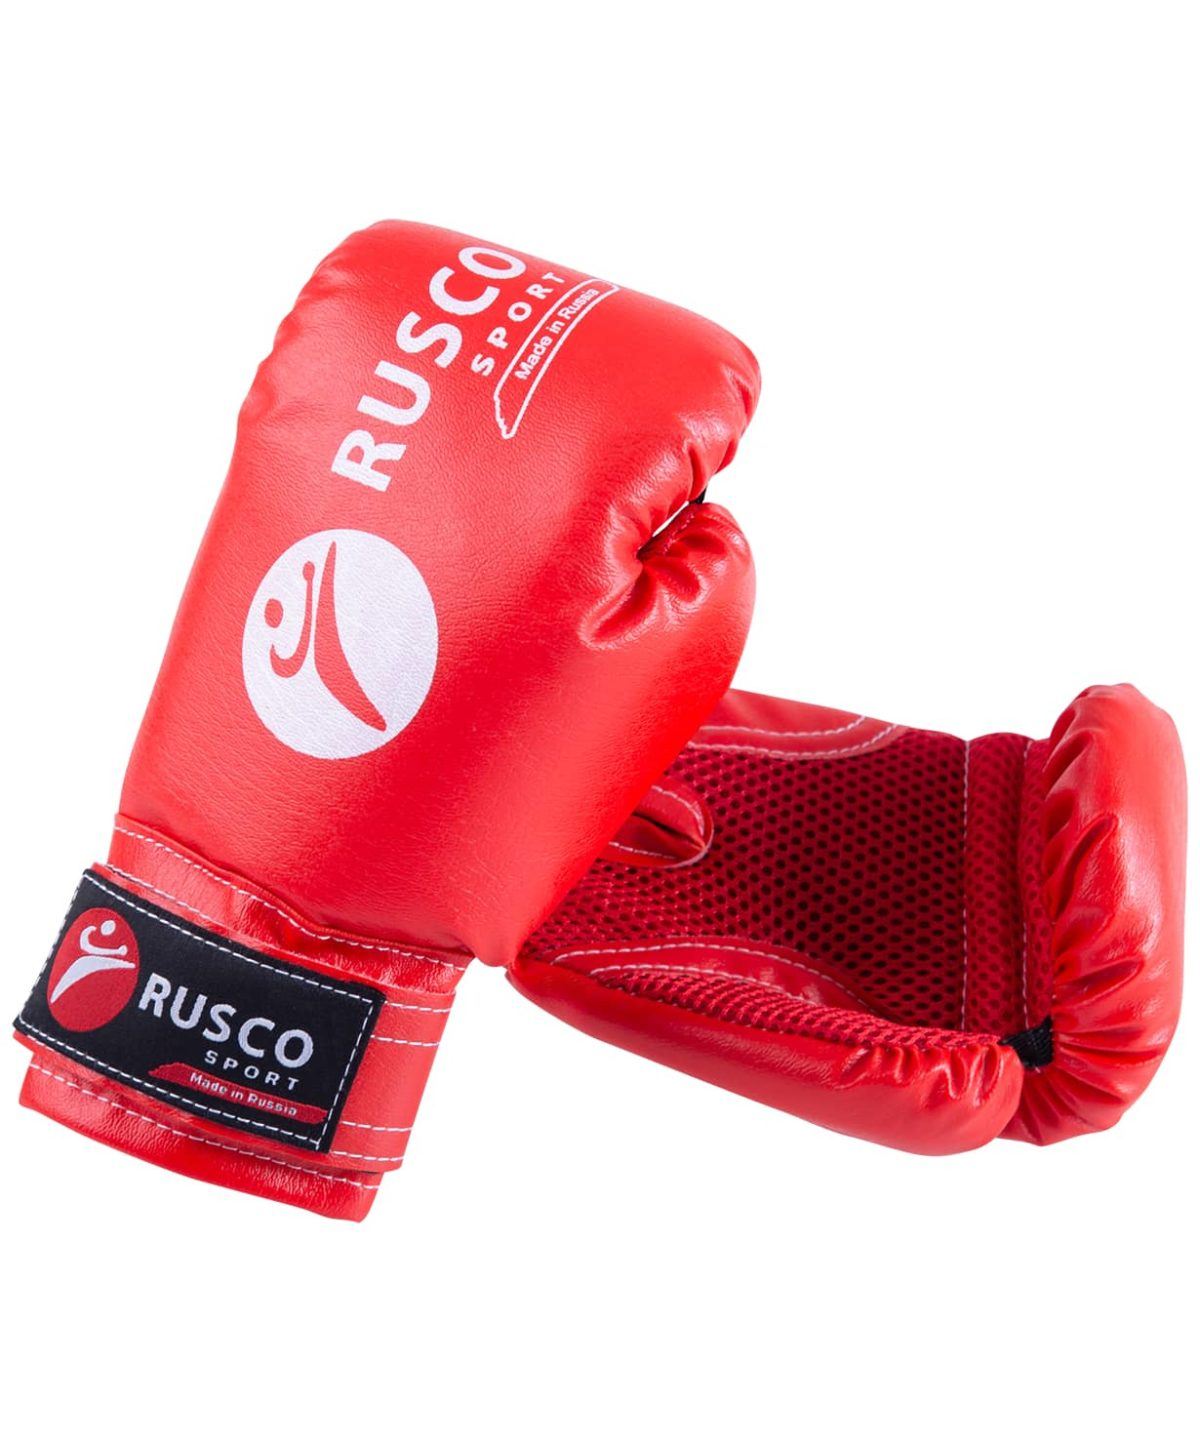 RUSCO Набор для бокса 4oz, к/з  18123 - 2